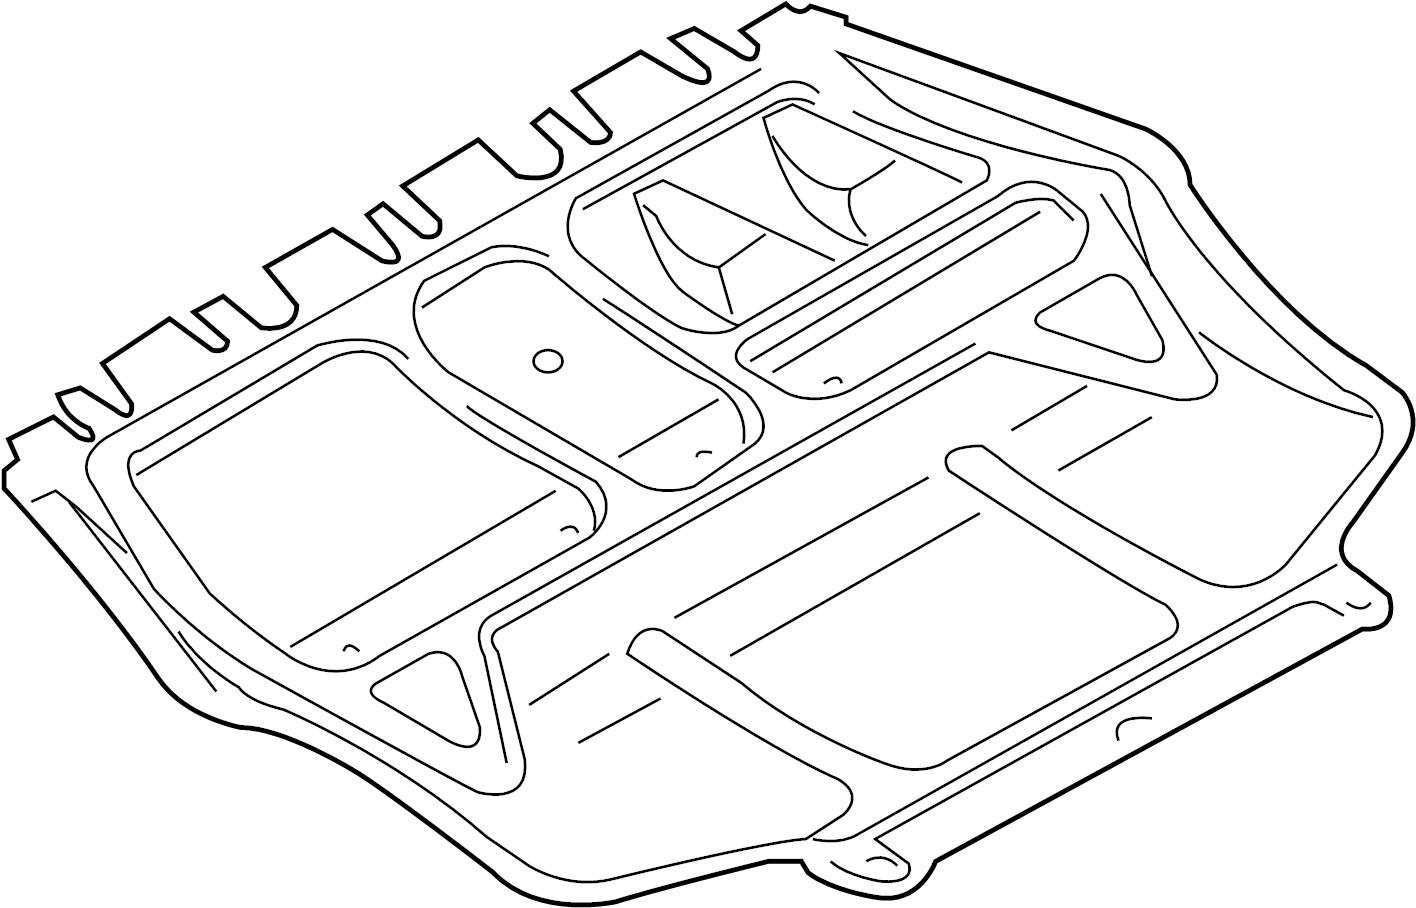 2010 Volkswagen Jetta Radiator Support Splash Shield